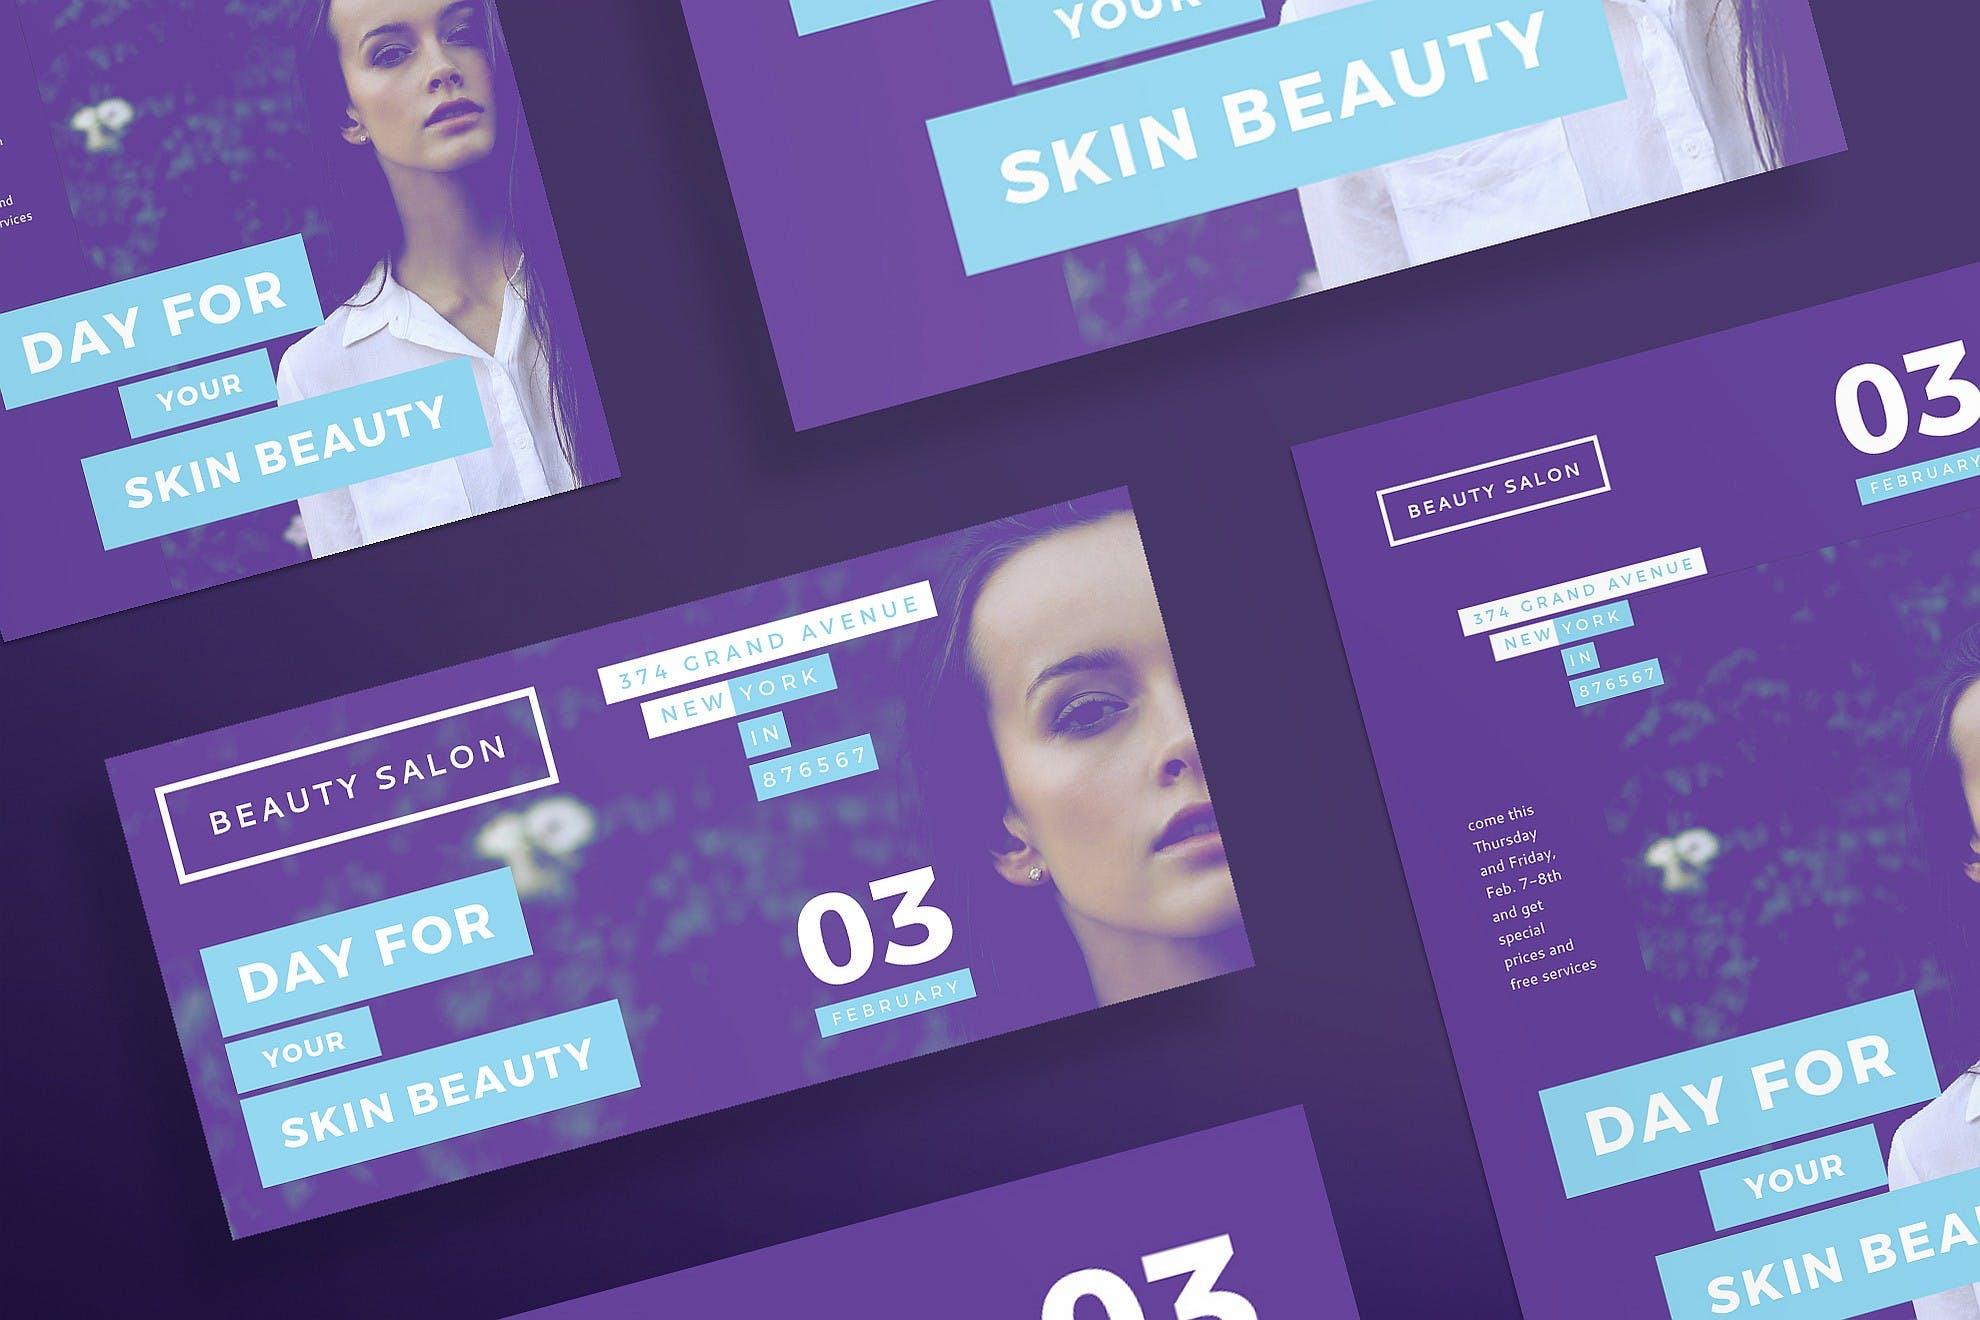 美容沙龙传单和海报模板Beauty Salon Flyer and Poster Template